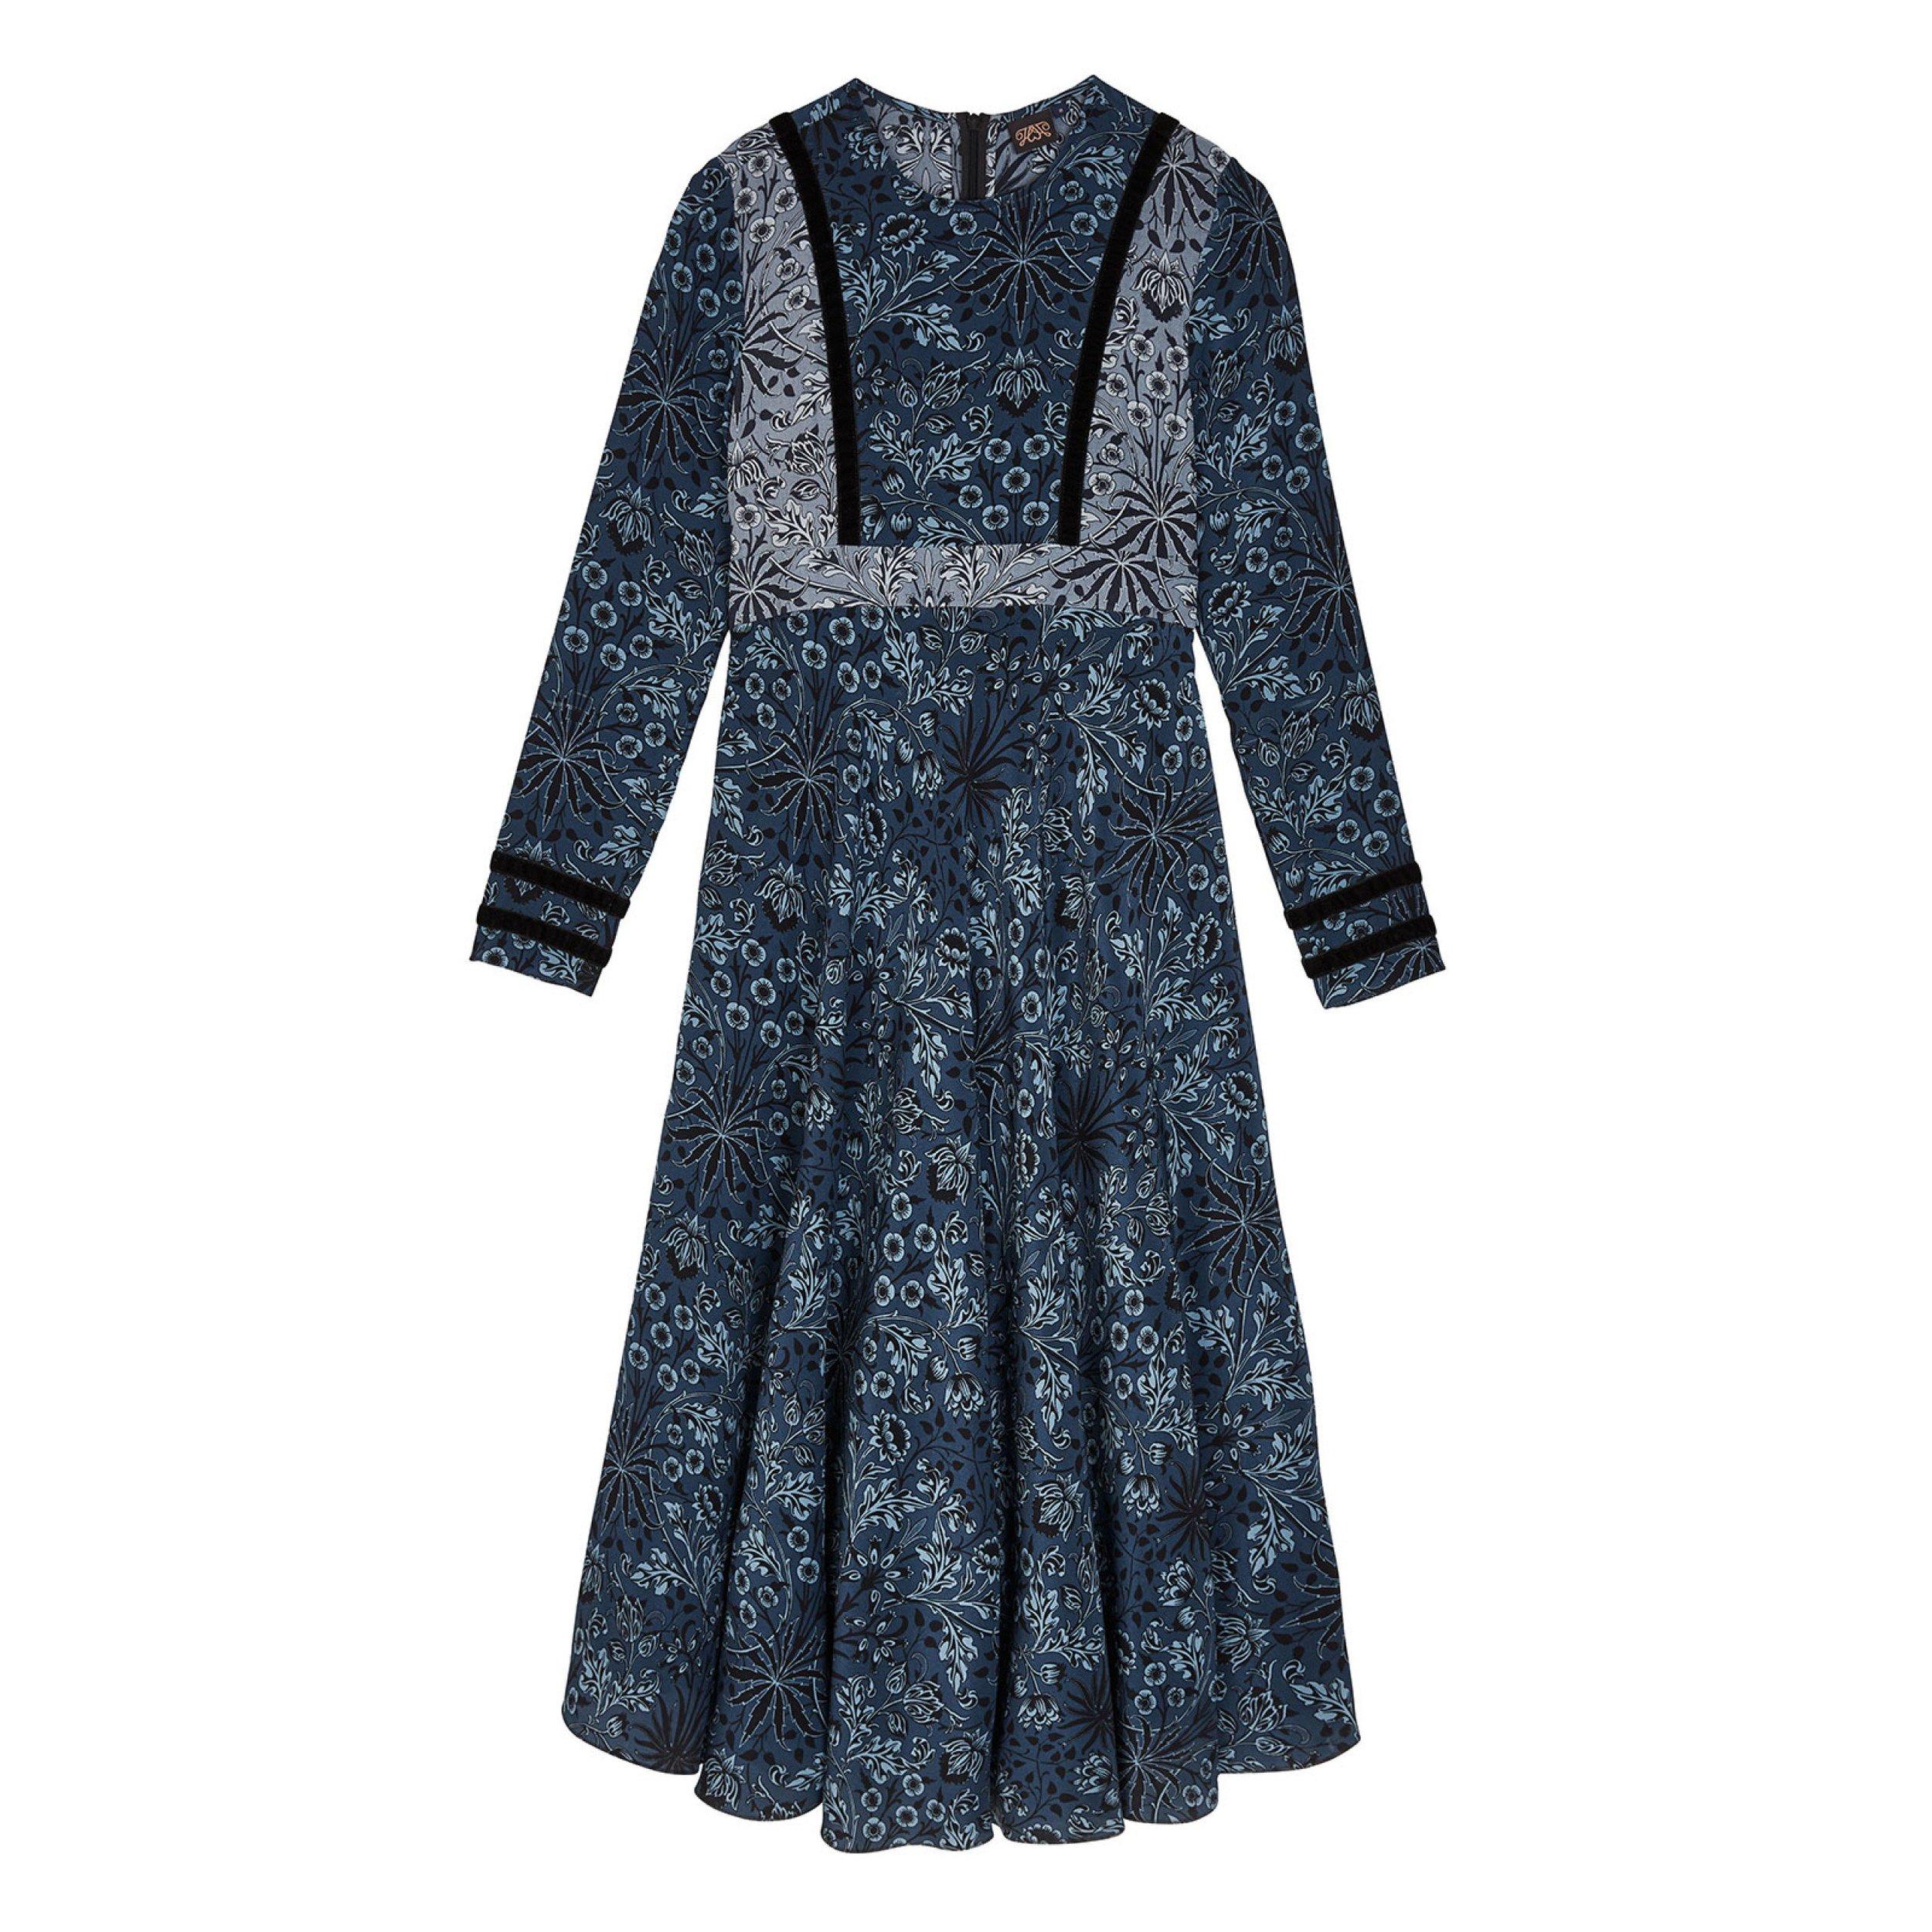 HOH dress